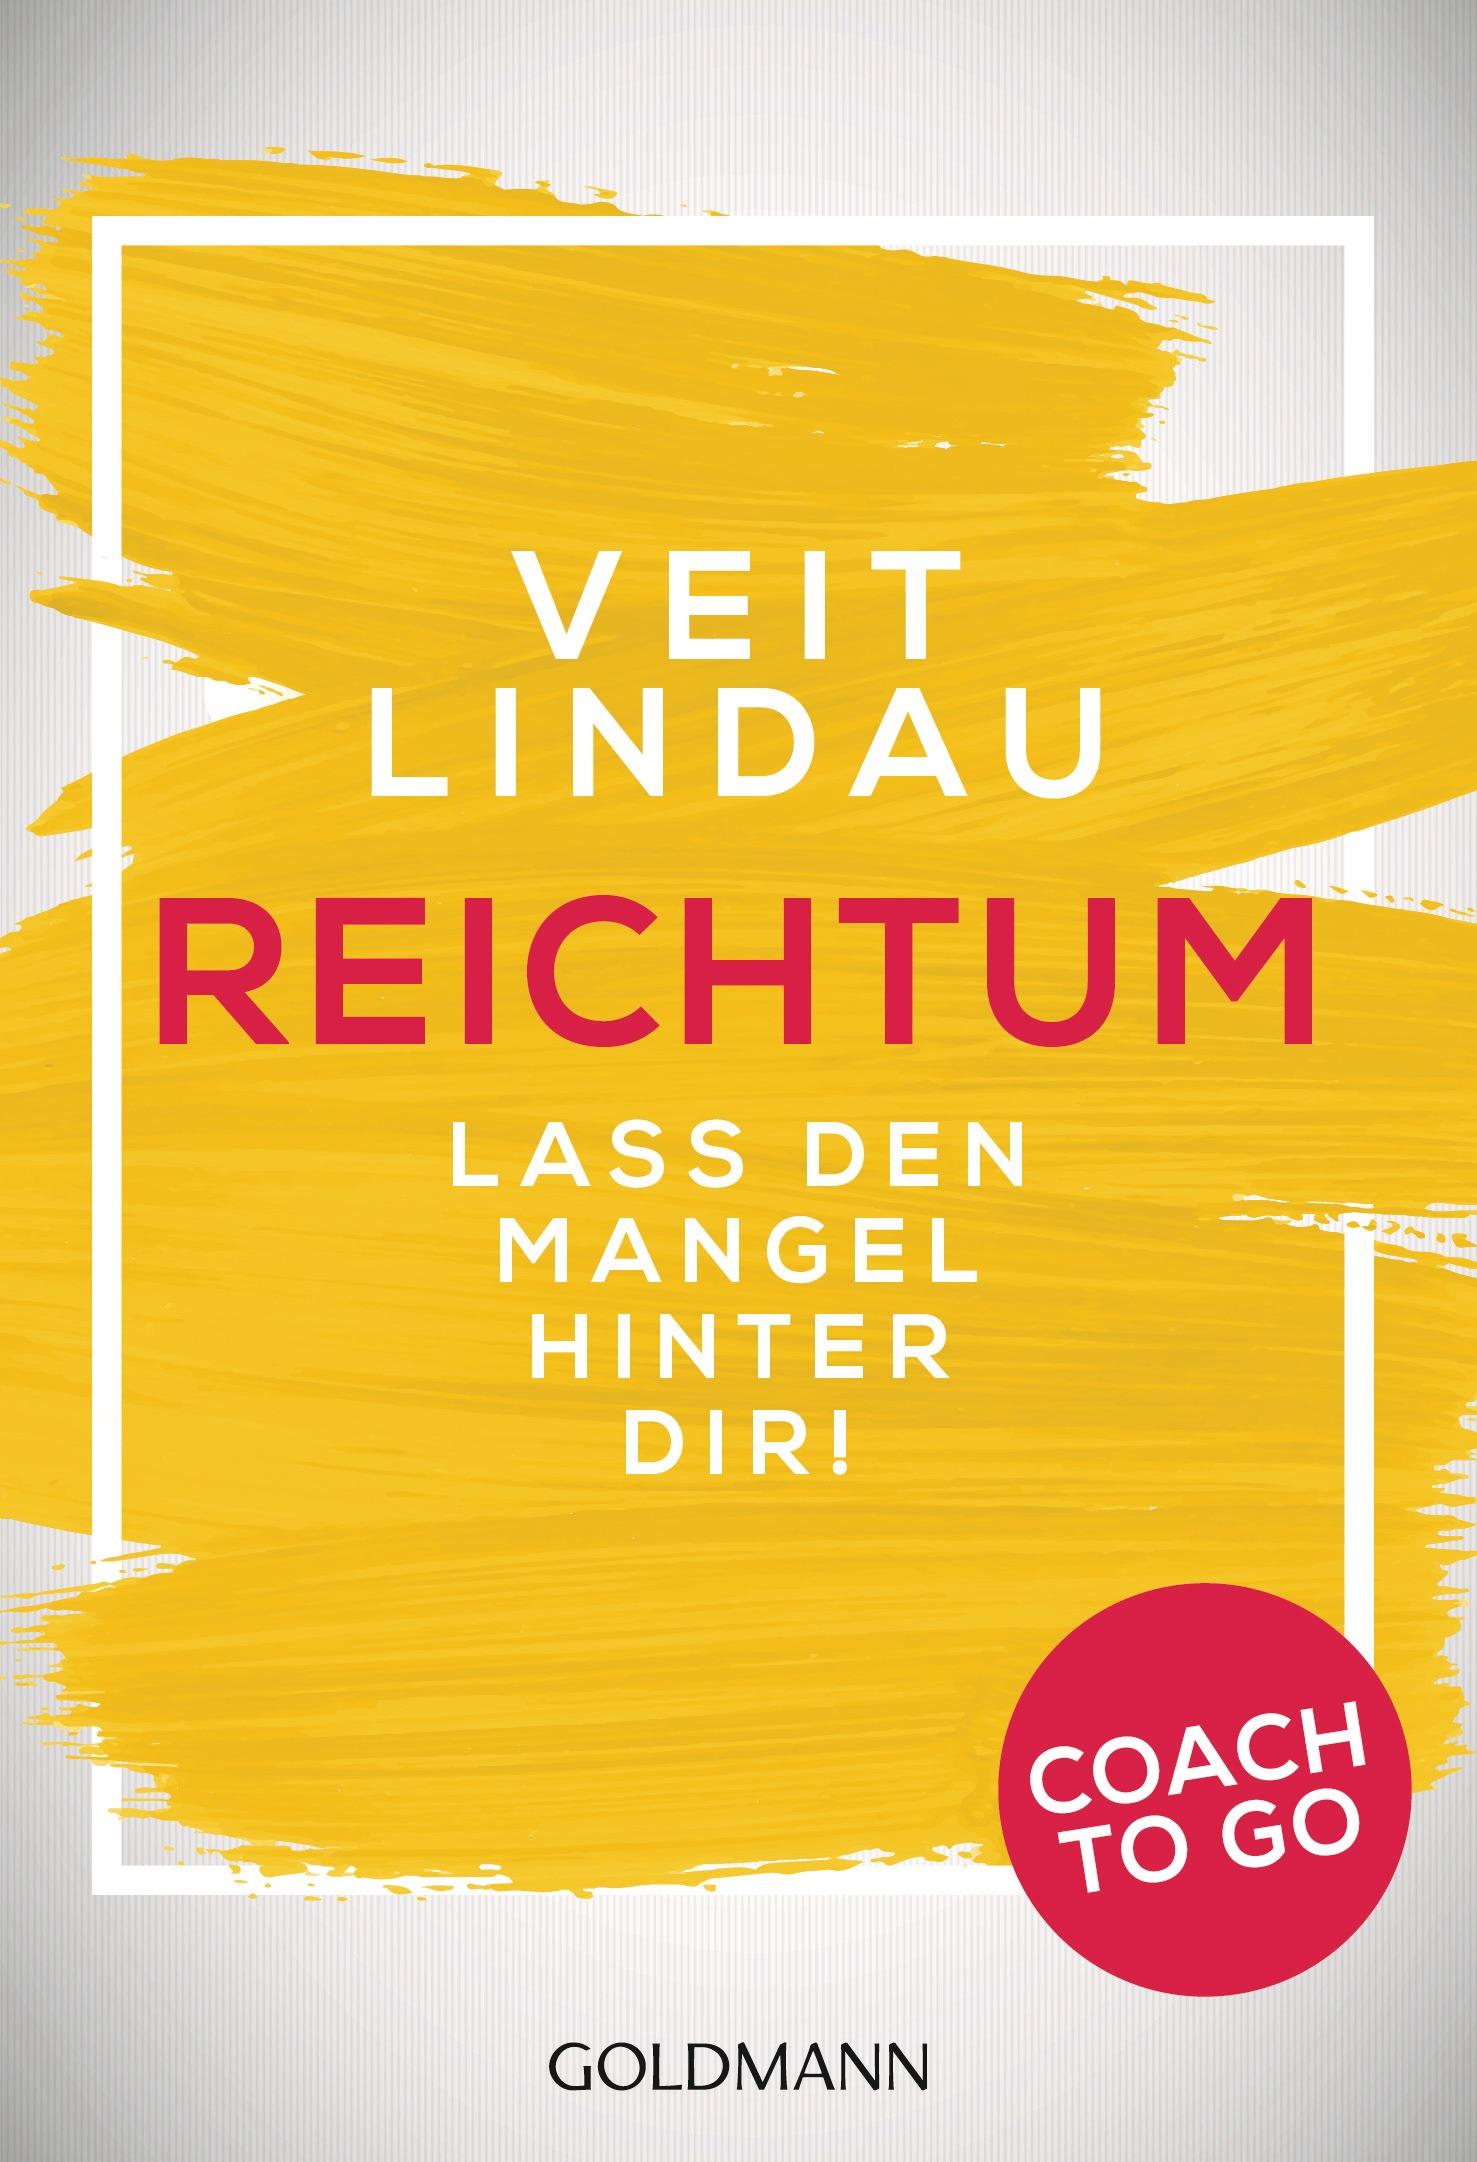 Coach to go Reichtum Lass den Mangel hinter dir Veit Lindau